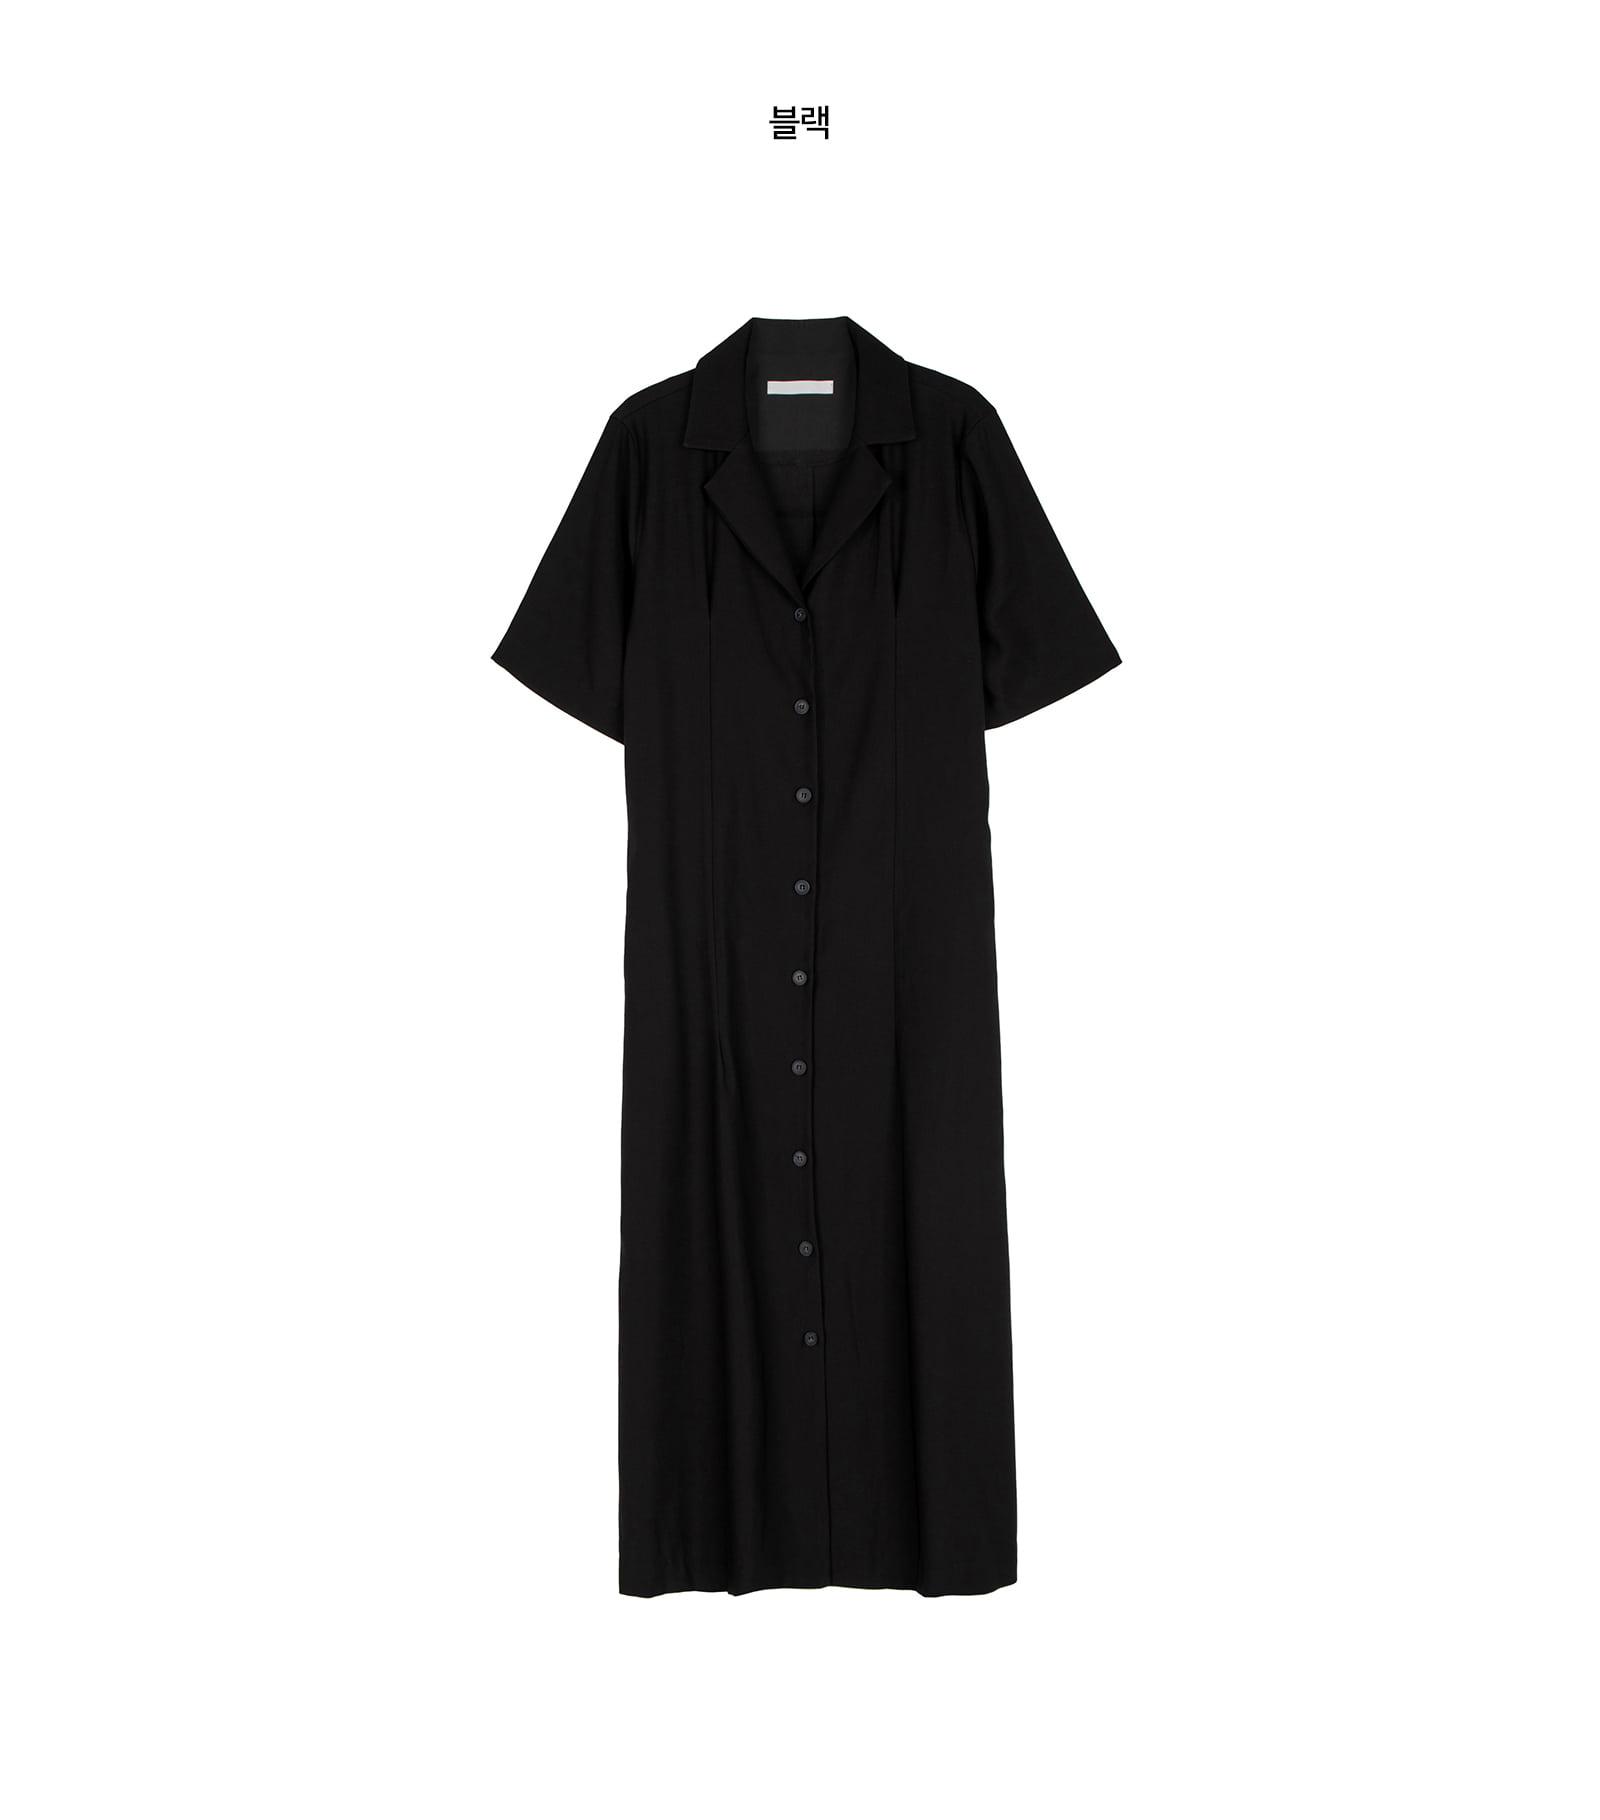 Moment button collarneck maxi dress